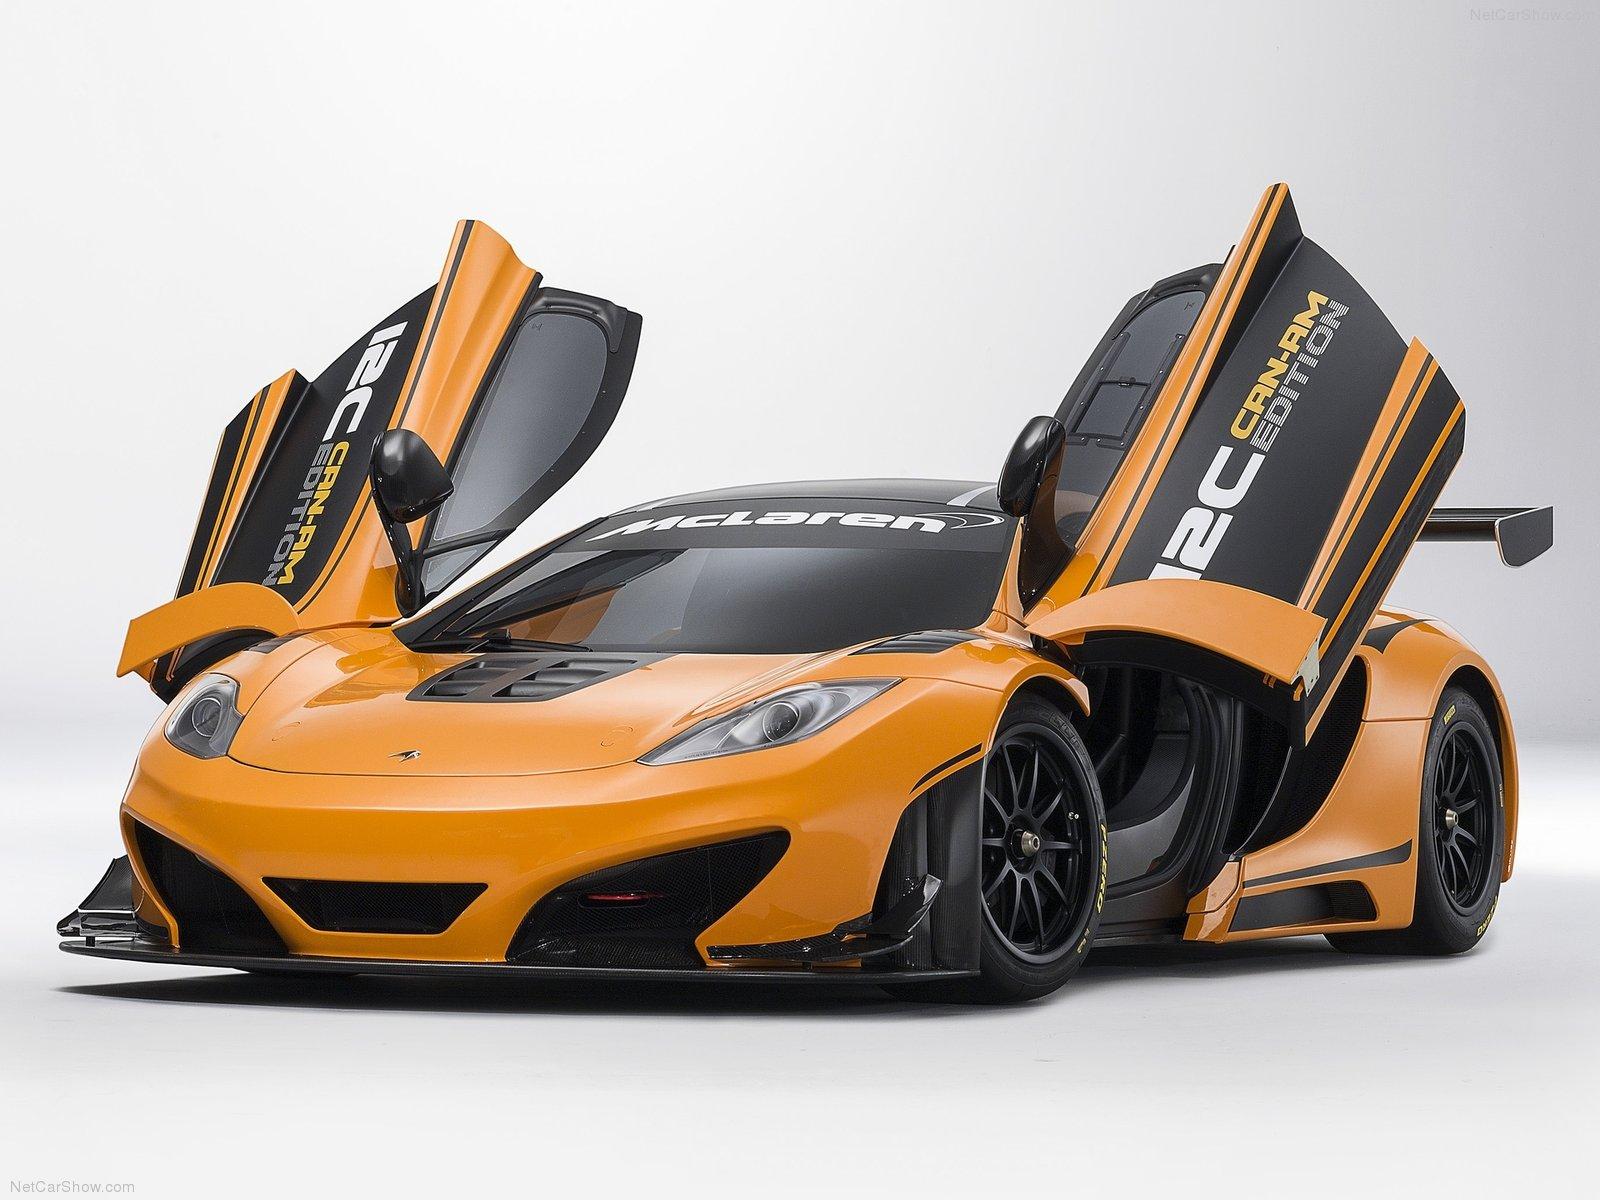 Hình ảnh siêu xe McLaren 12C Can-Am Edition Concept 2012 & nội ngoại thất